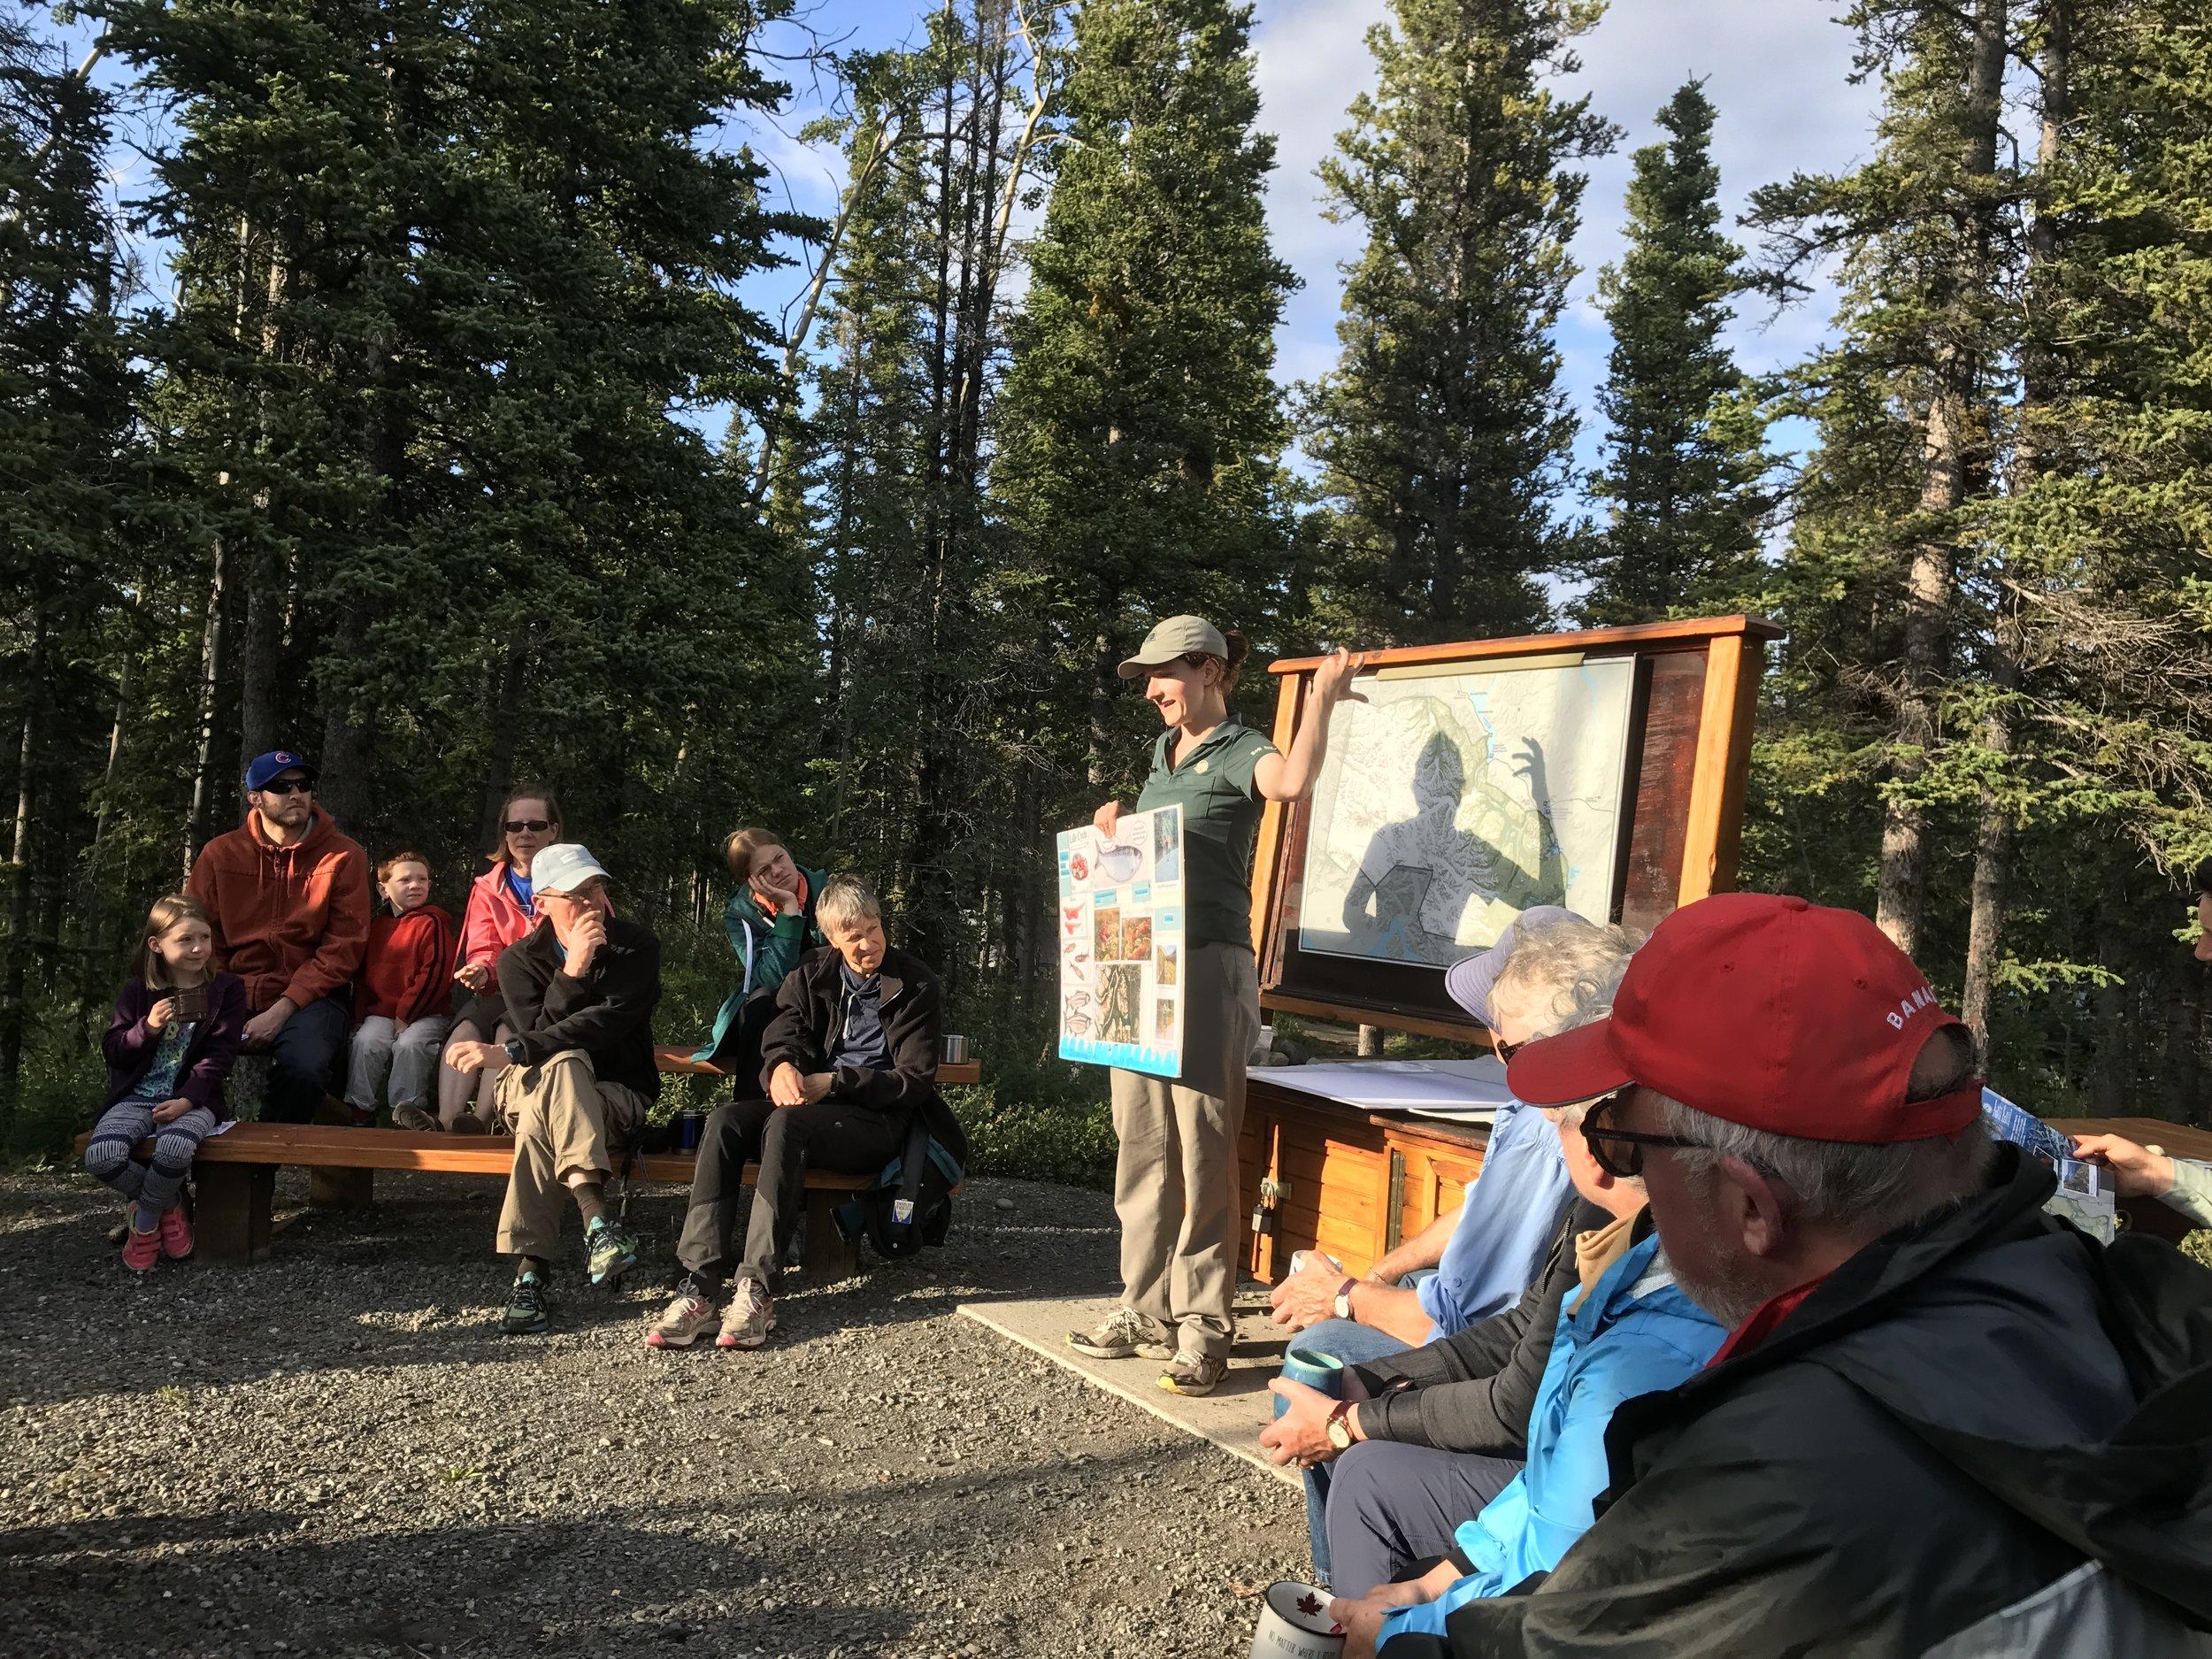 Ranger explaining the history and lifecycle of the  kokanee salmon.